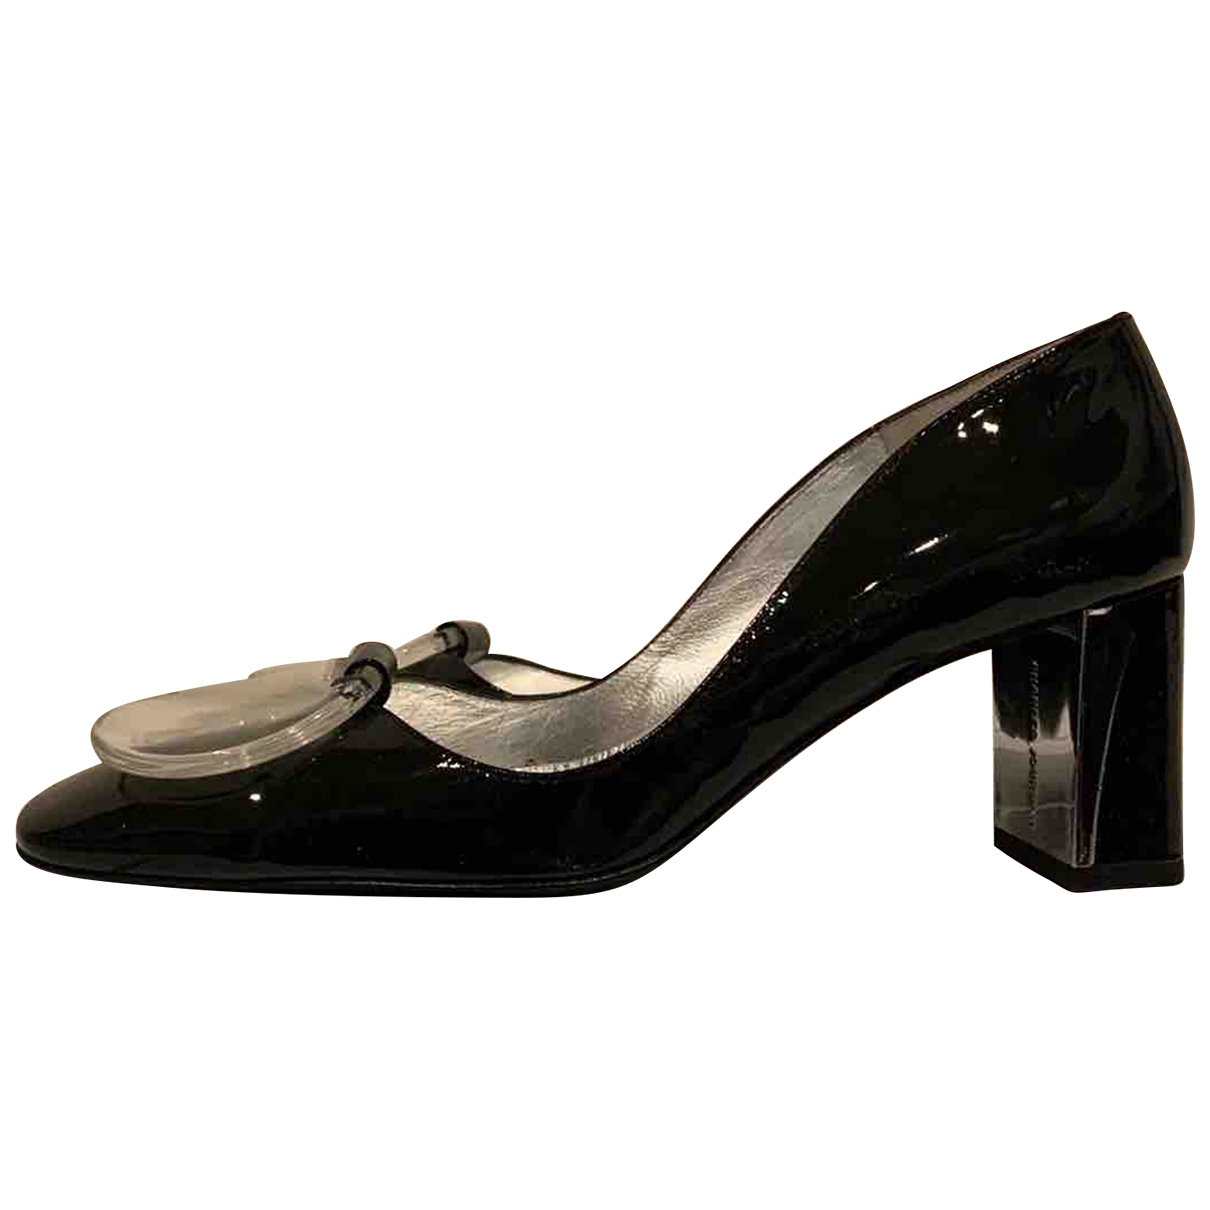 Charles Jourdan \N Black Patent leather Heels for Women 37 EU